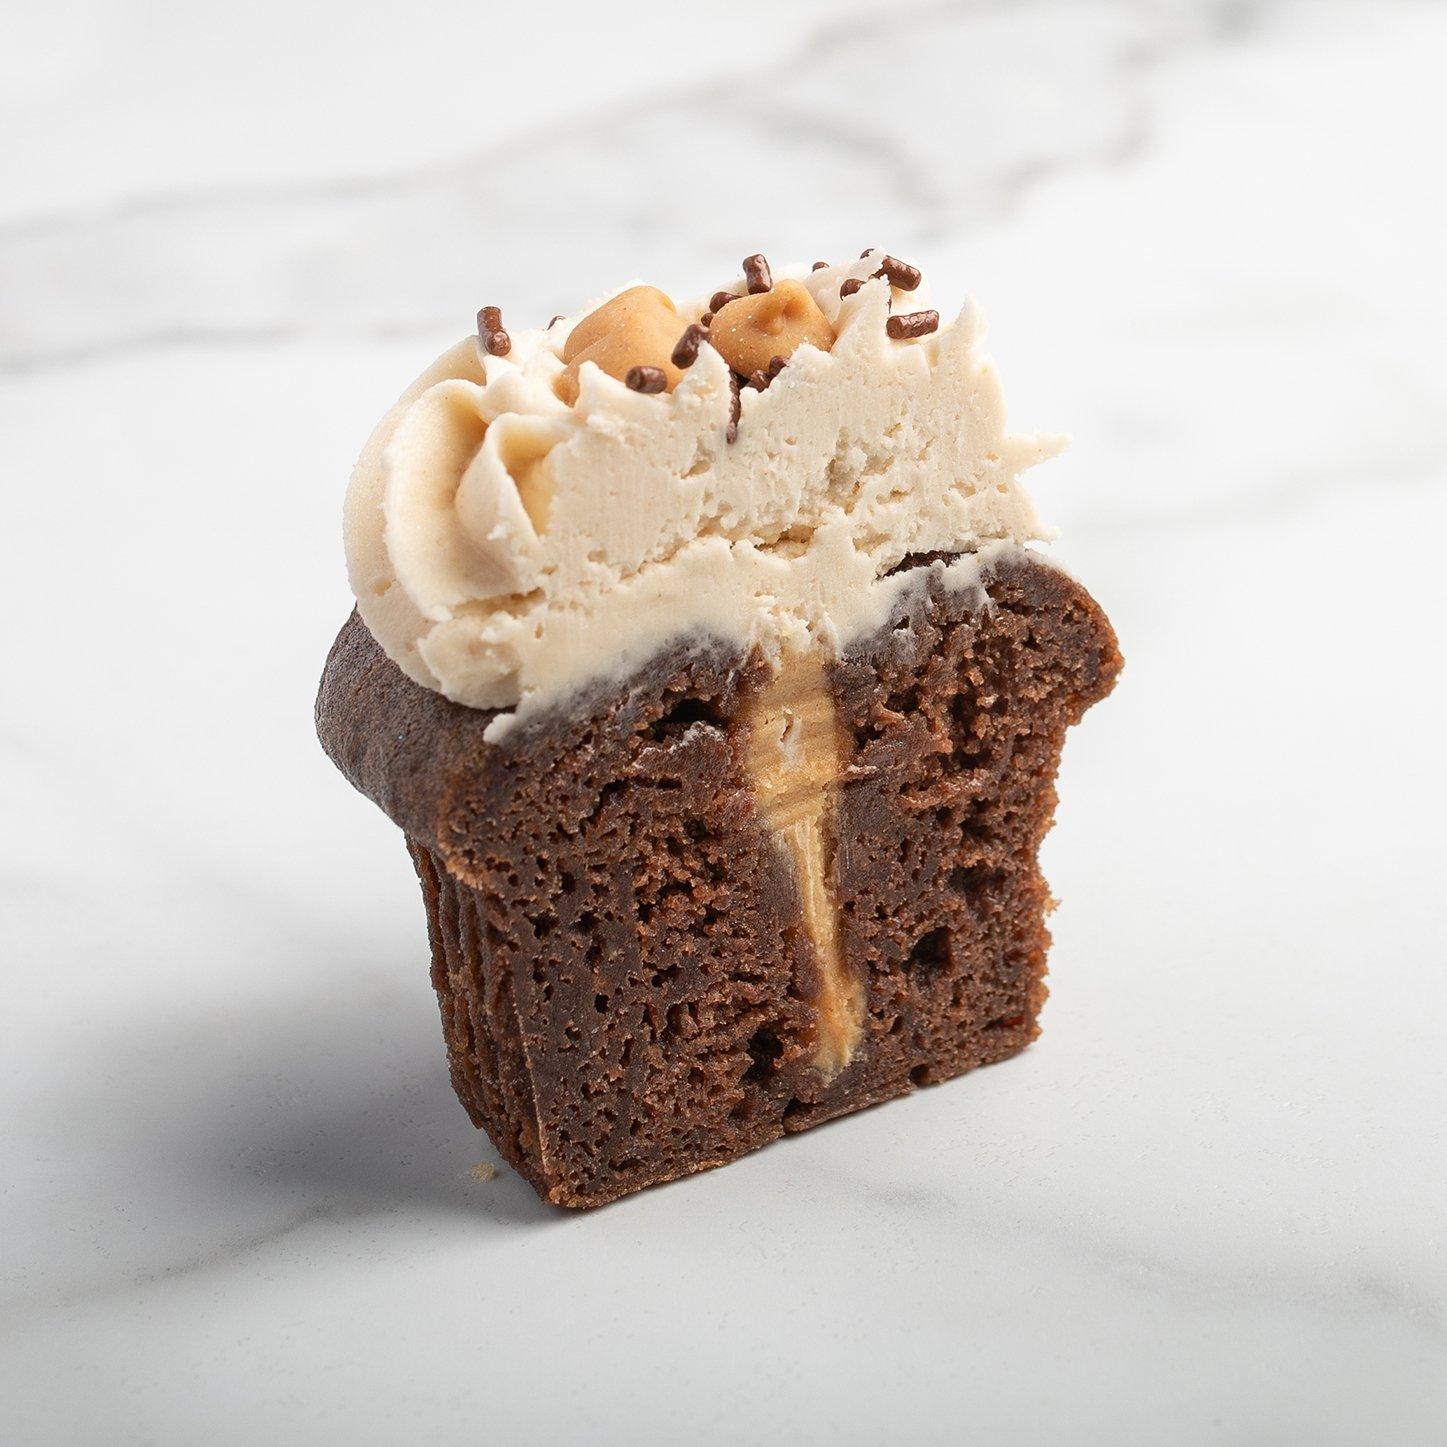 Chocolate Peanut Butter Attack (GF) - Standard